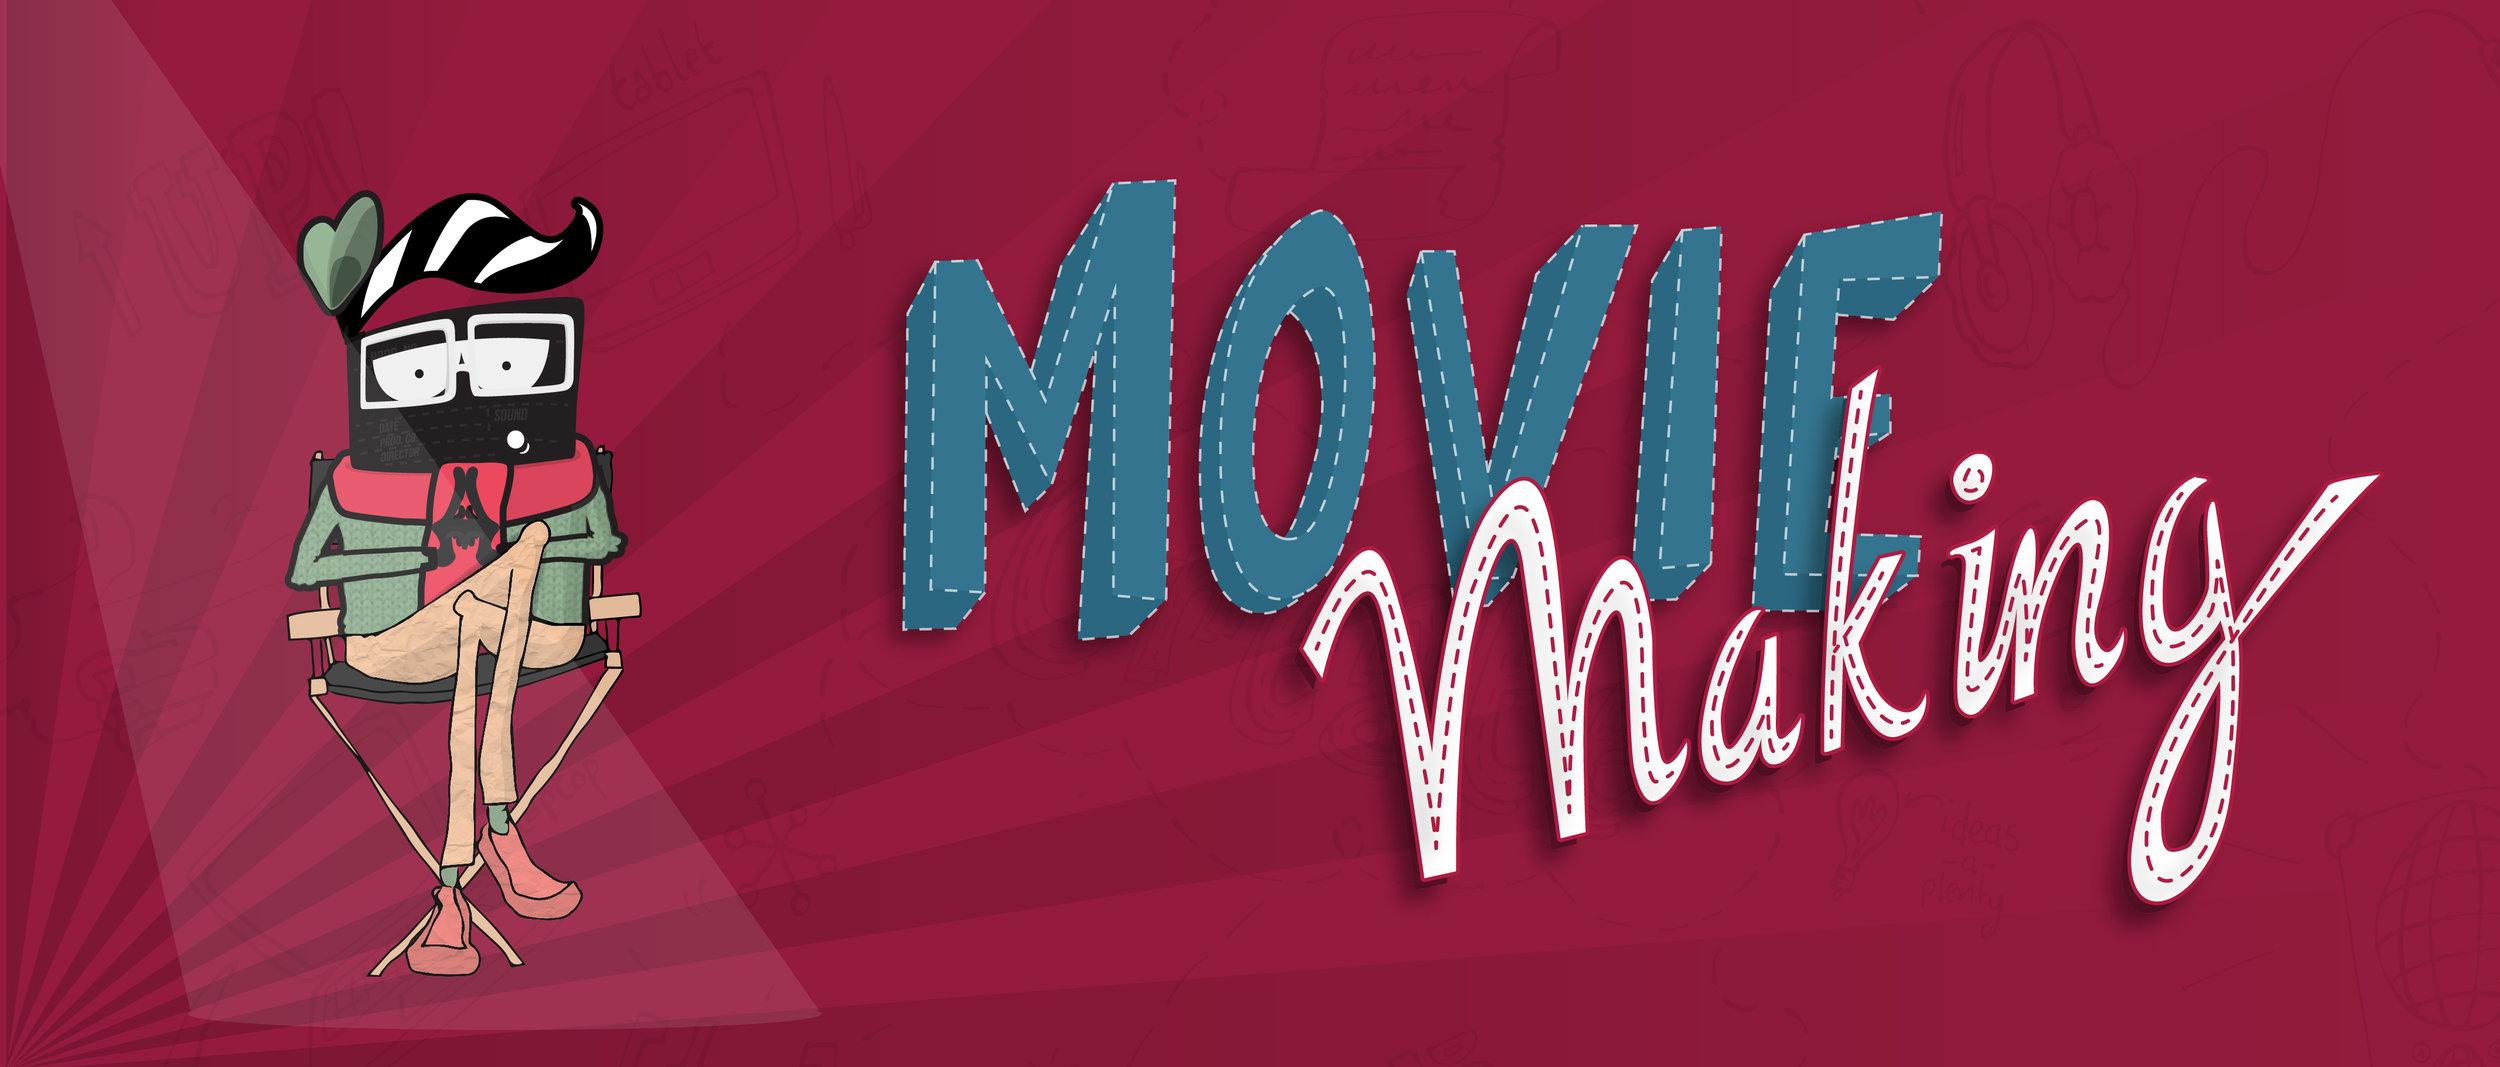 Movie Making website banner.jpg